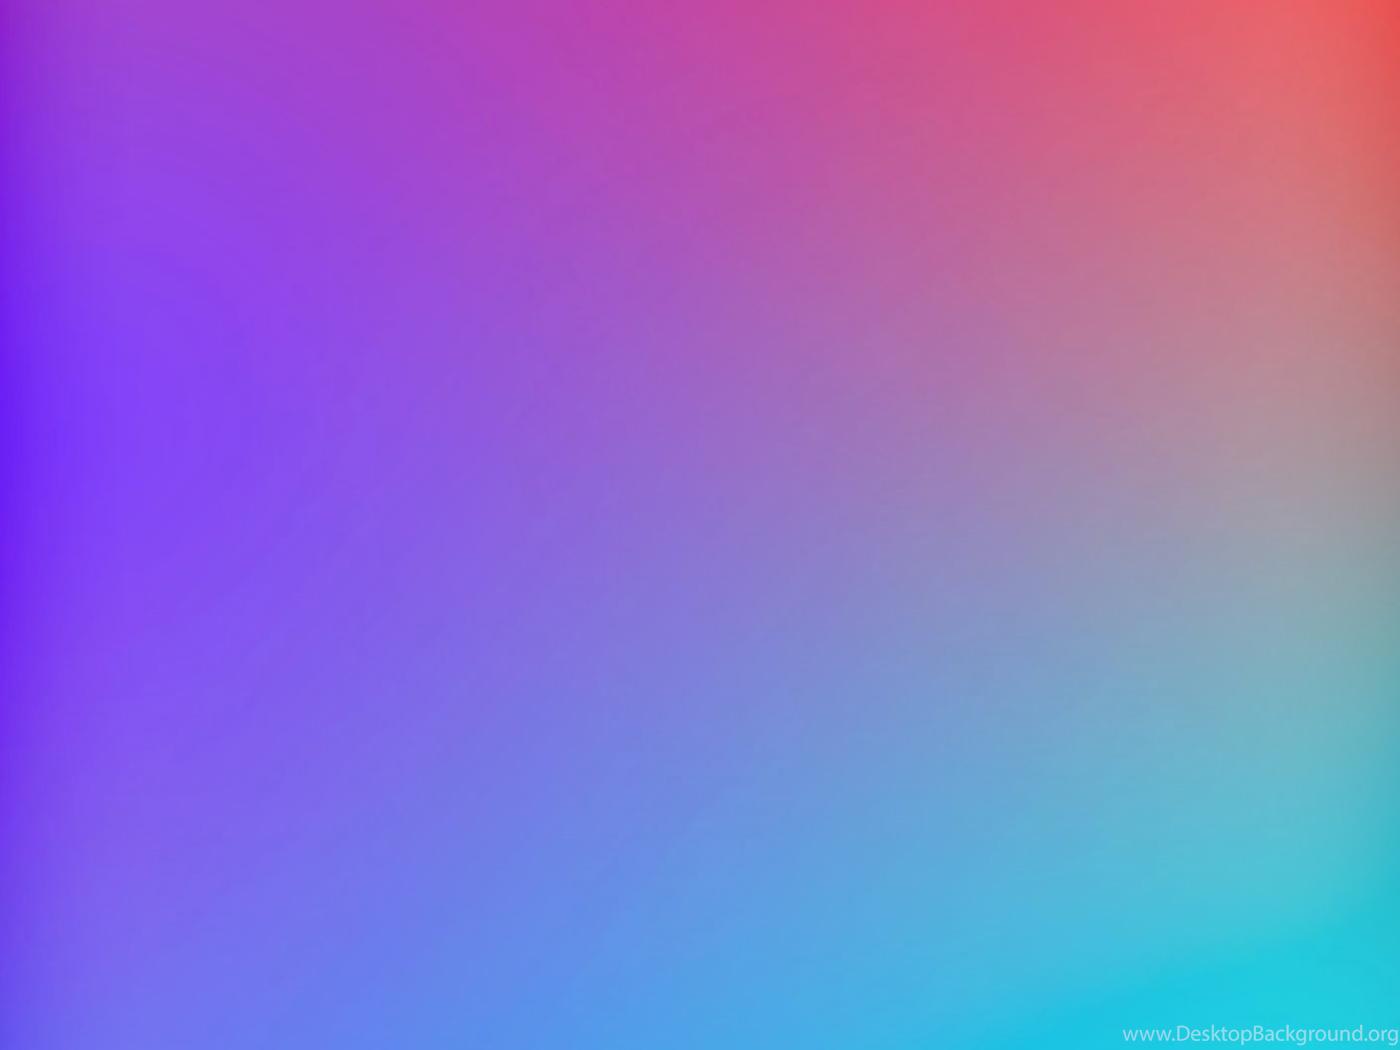 Ipad Retina Wallpaper For Iphone X 8 7 6: Apple Music Wallpaper IPhone HD Retina Parallax 2.png